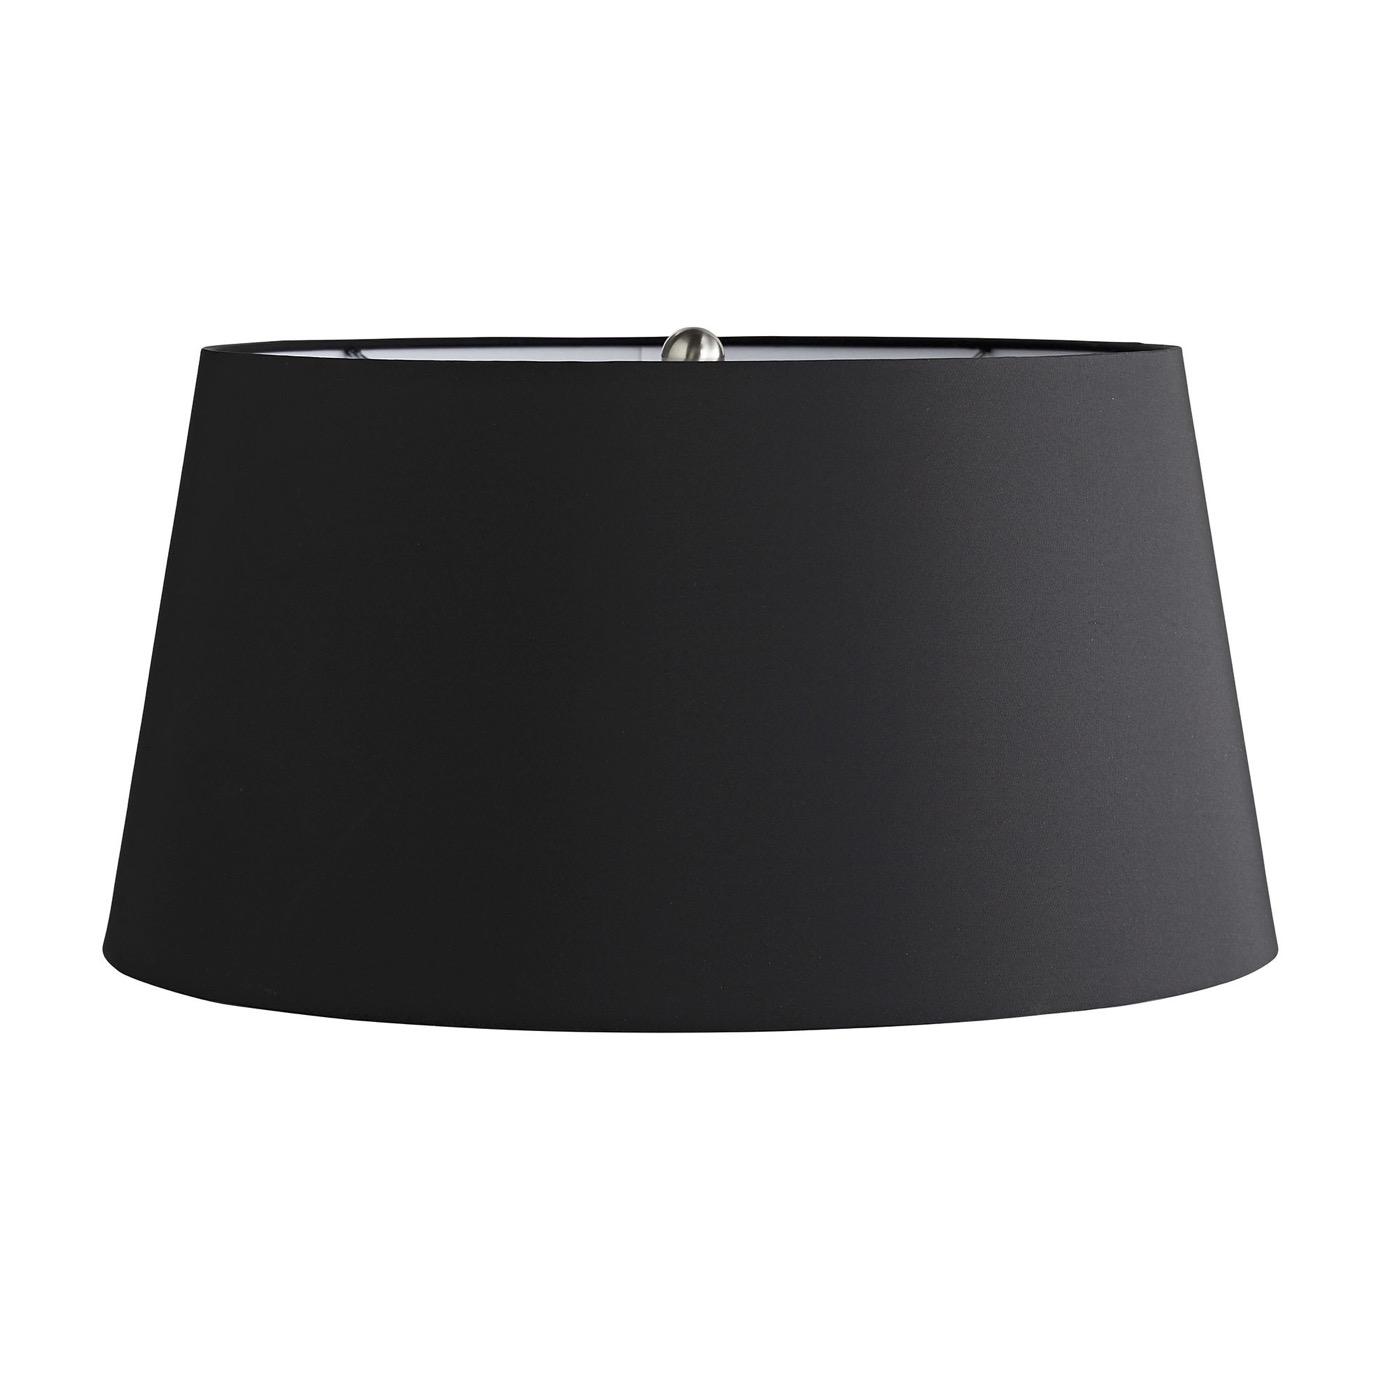 Edgar B&W Glass Table Lamp